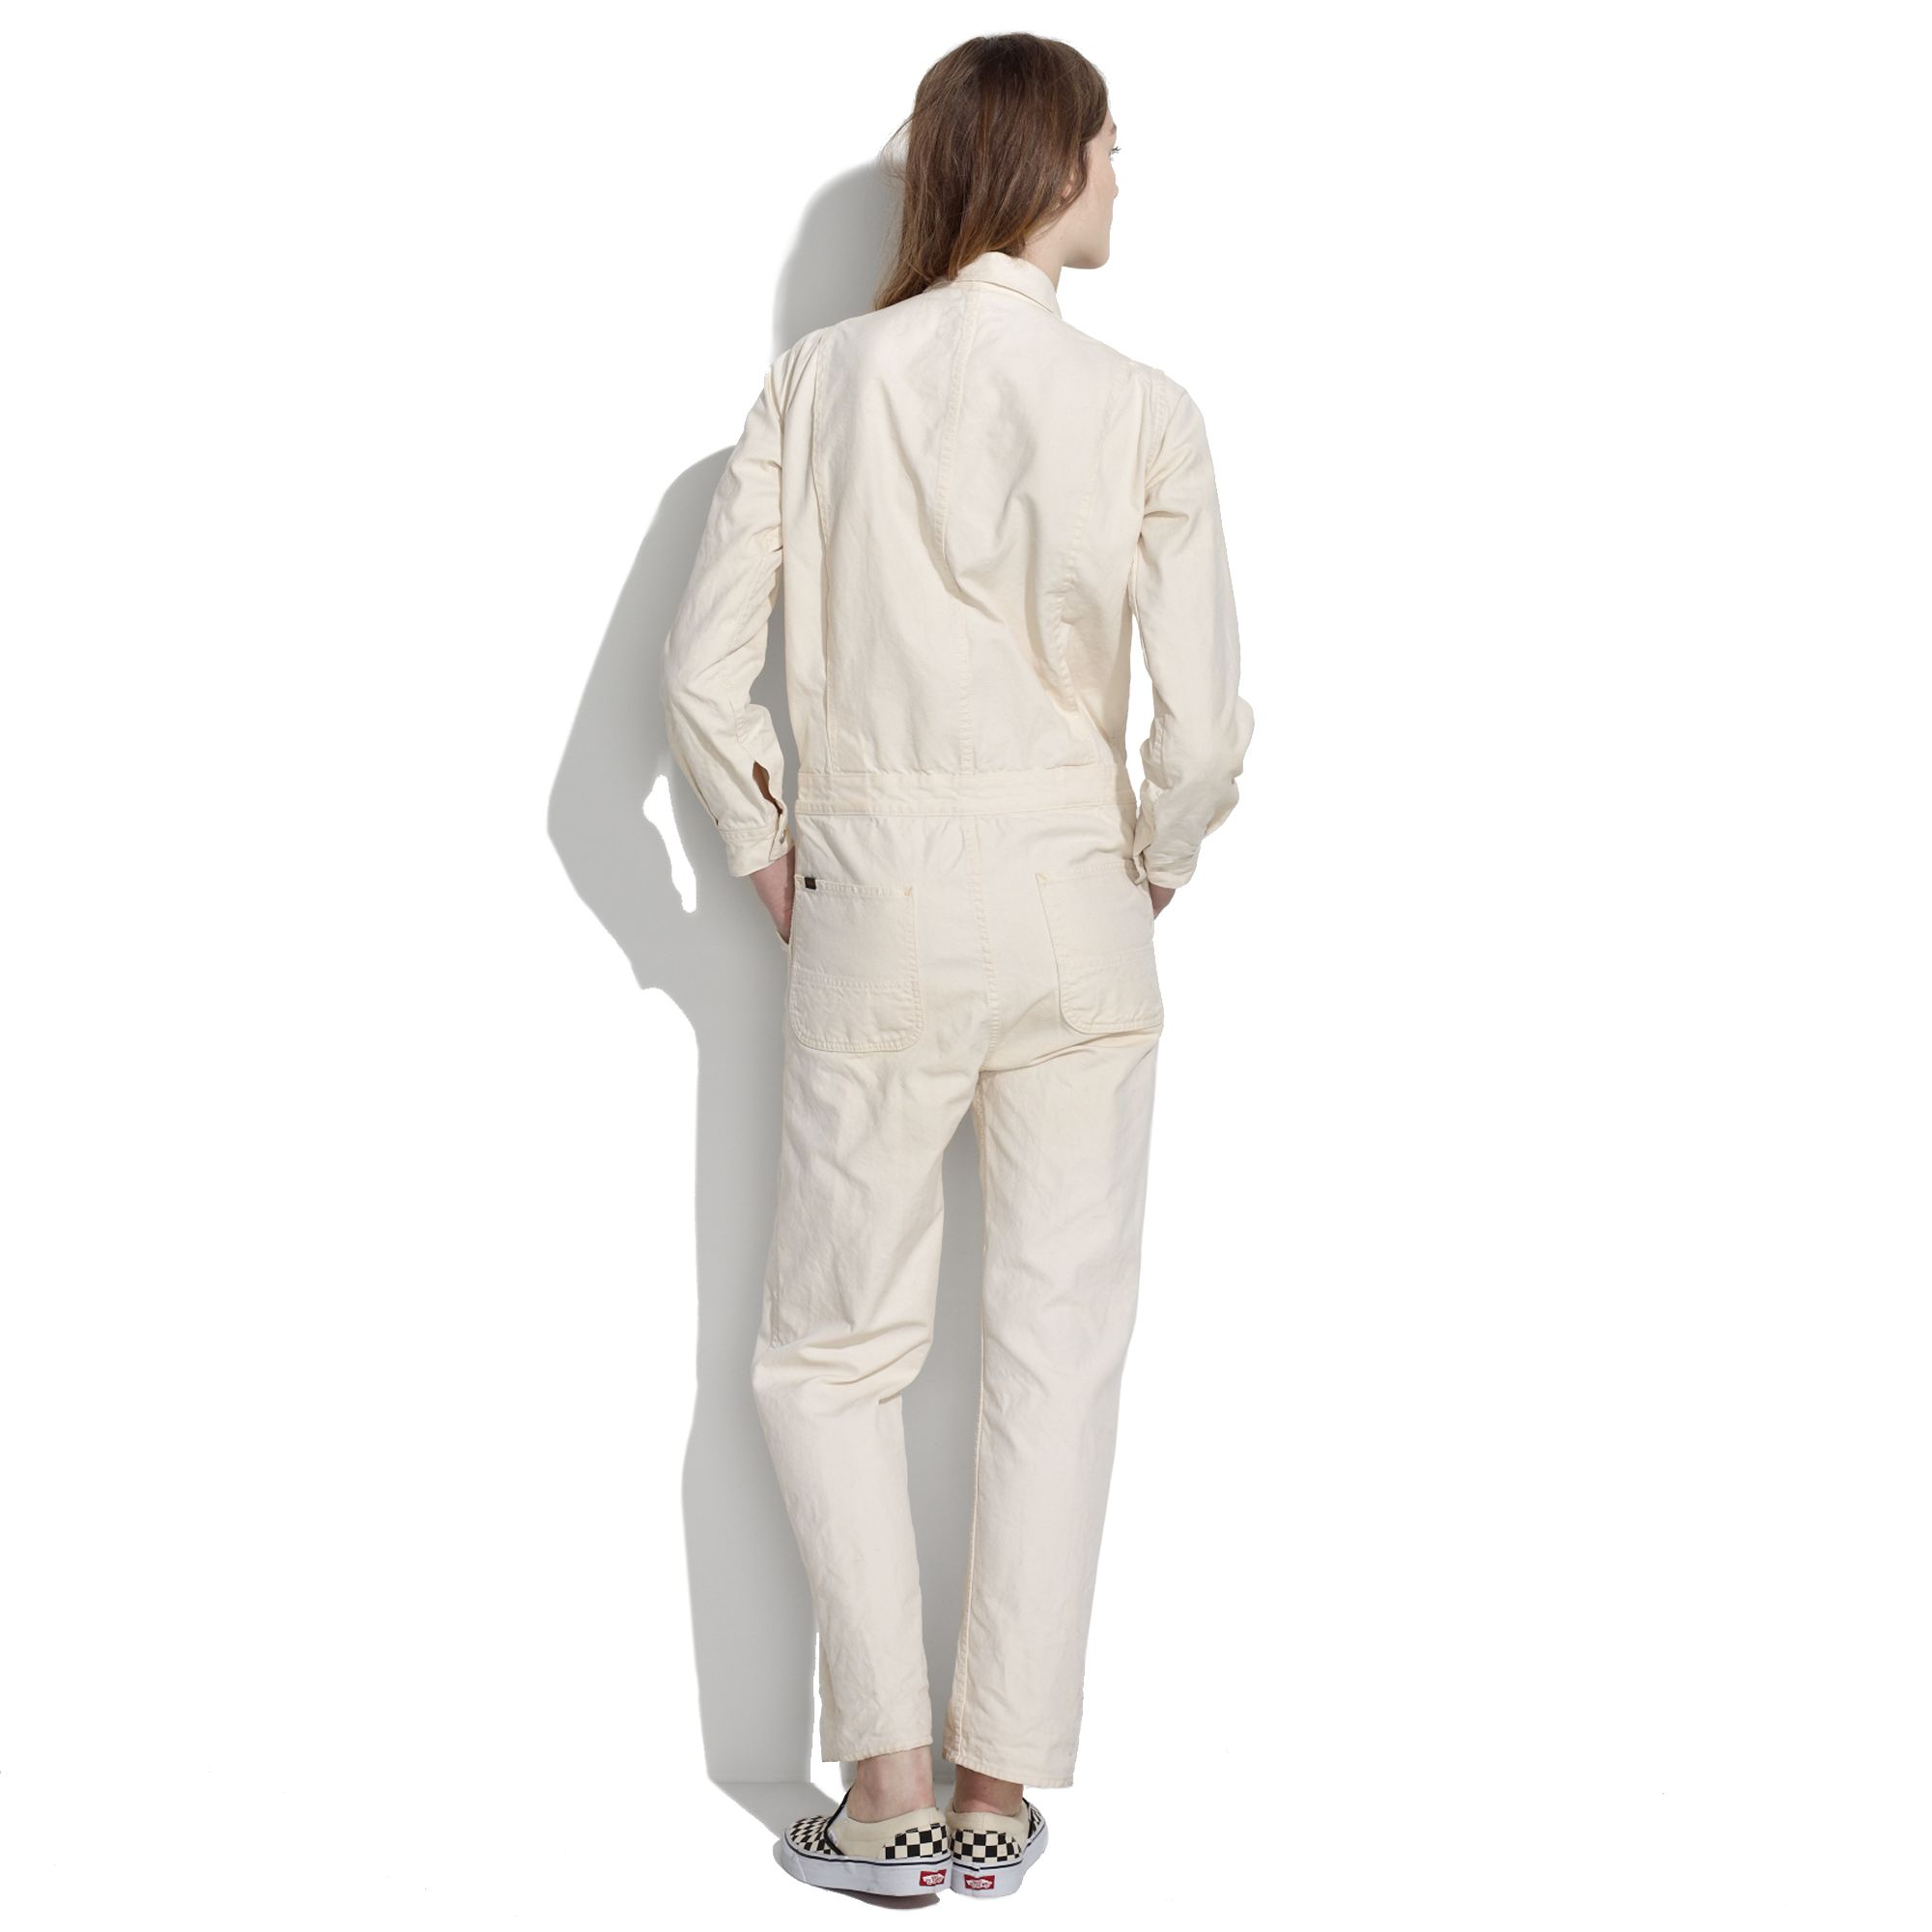 Madewell Herringbone Work Jumpsuit in White | Lyst